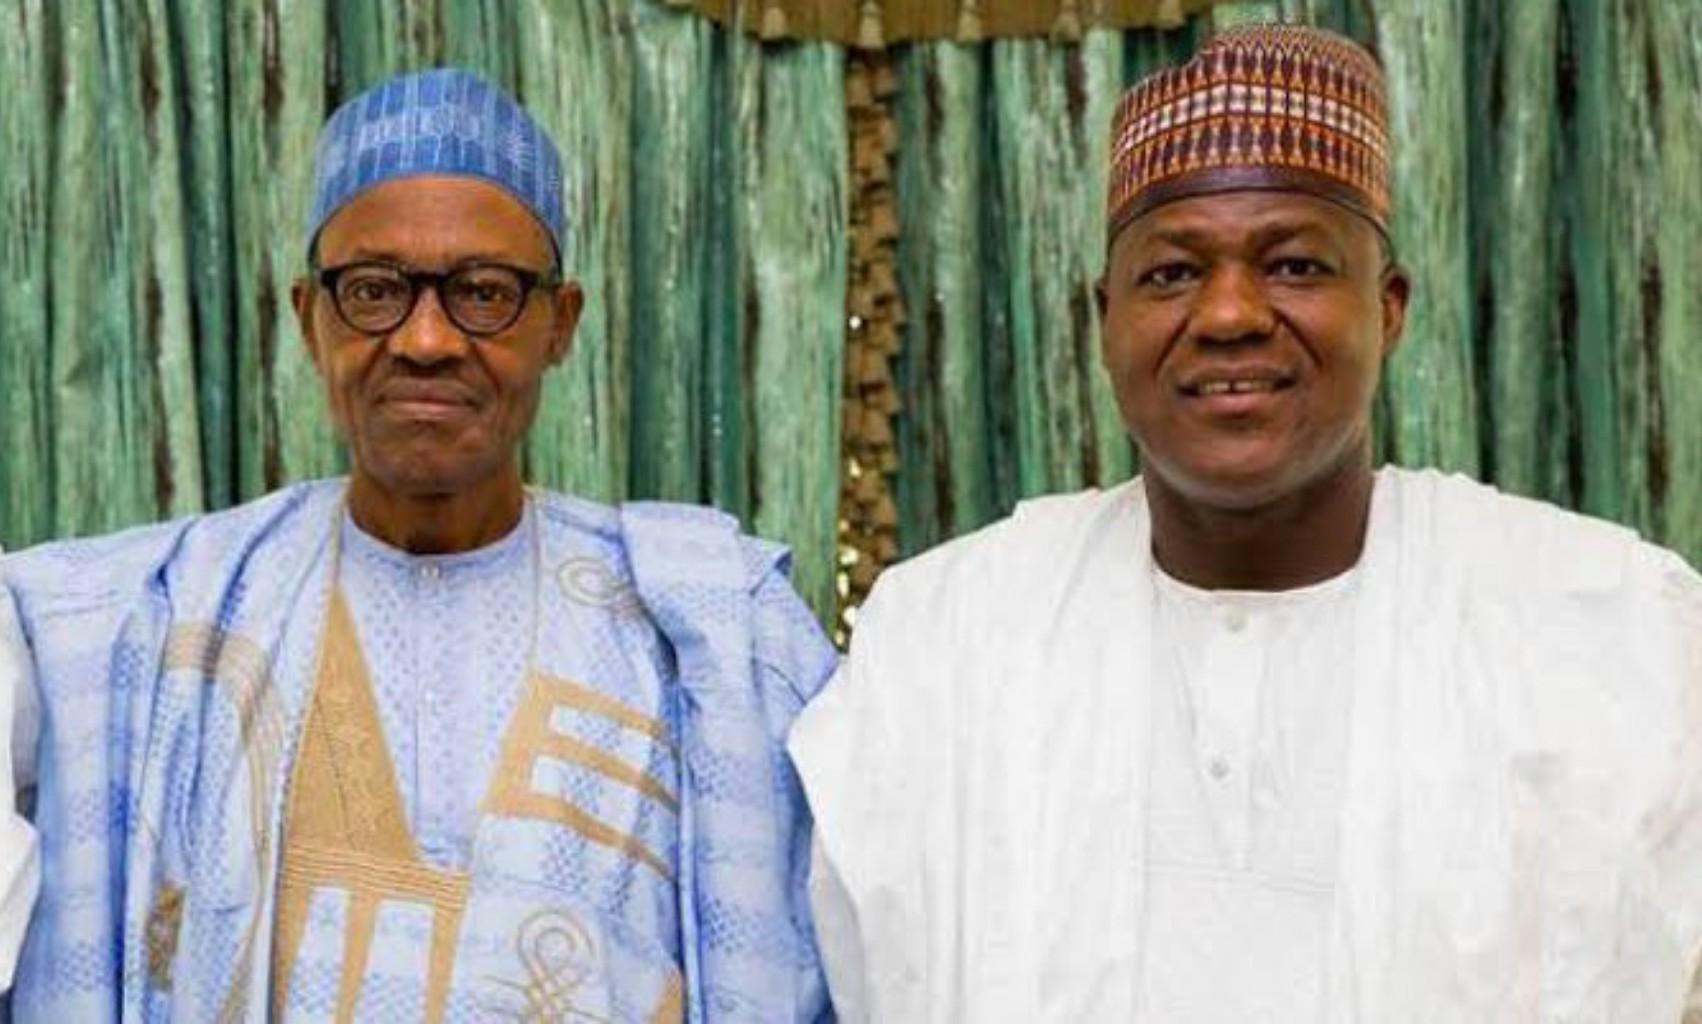 BREAKING: Dogara returns to APC, meets Buhari